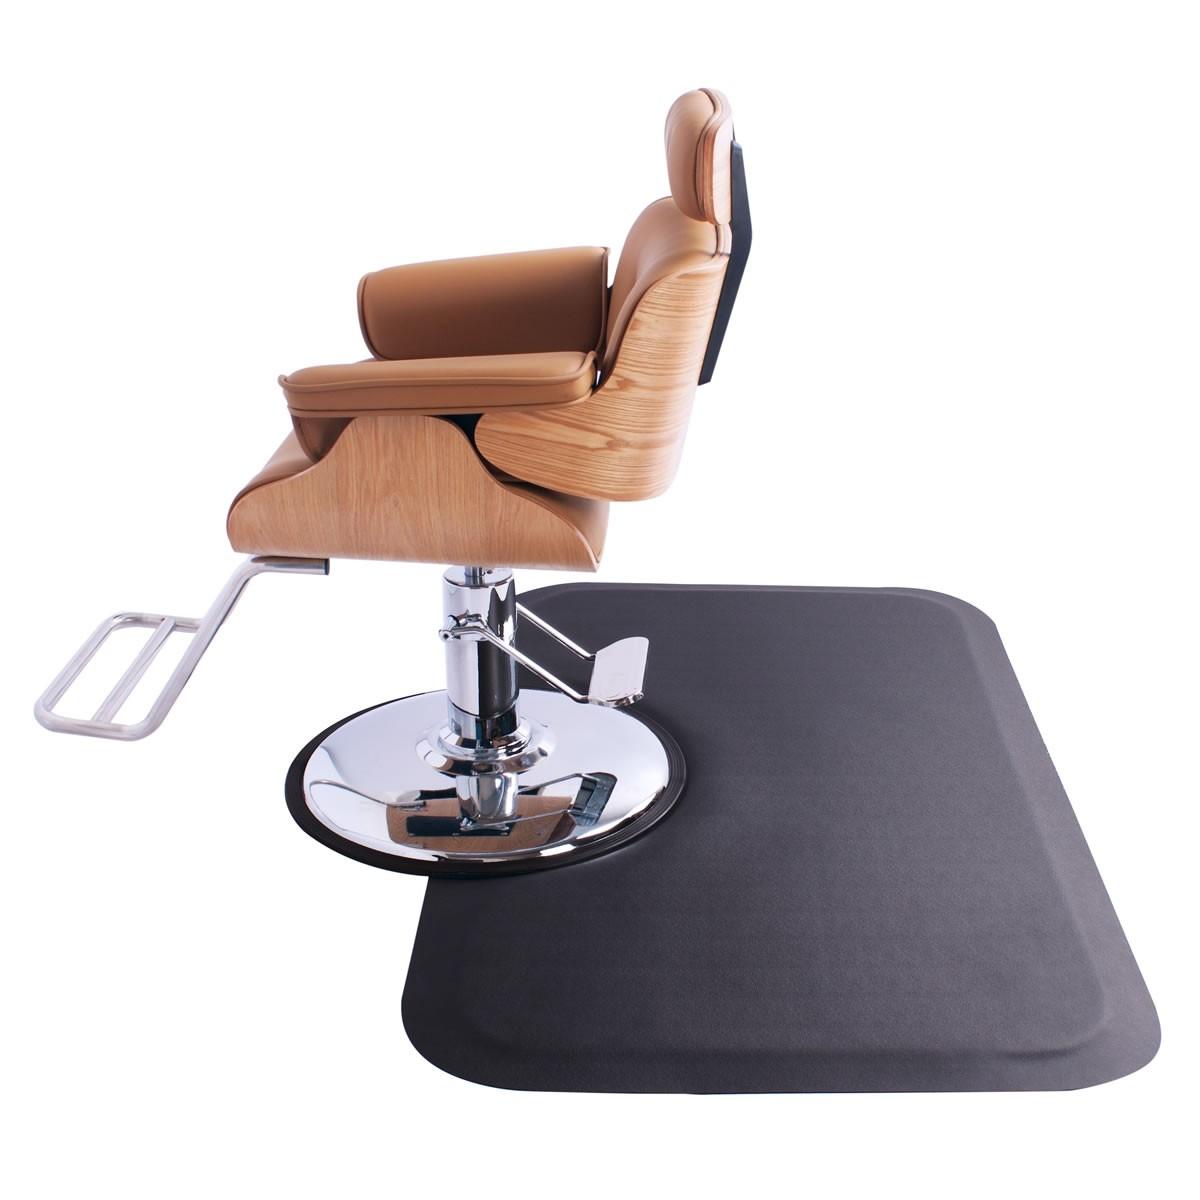 Square Salon Floor Mat for Round Base, Anti Fatigue Salon Mat, Salon Supplies